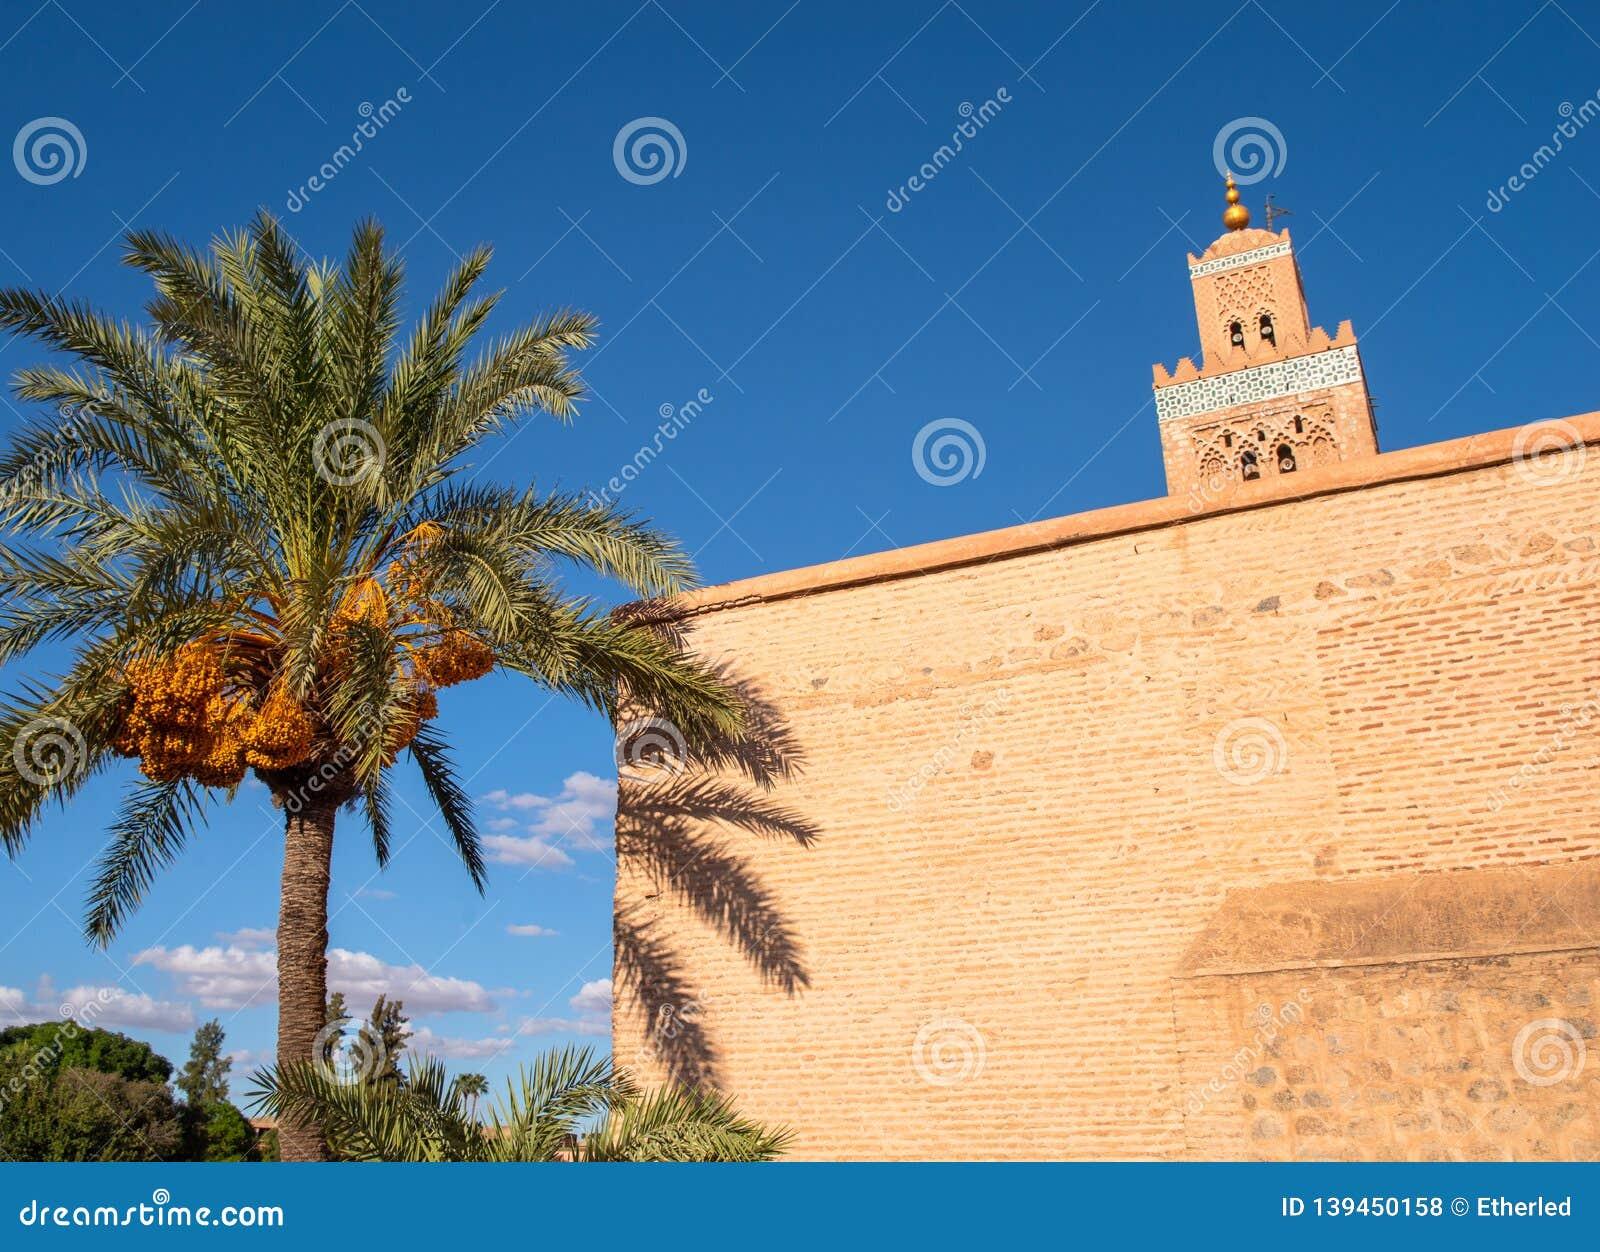 Koutoubiamoskee in Marrakech